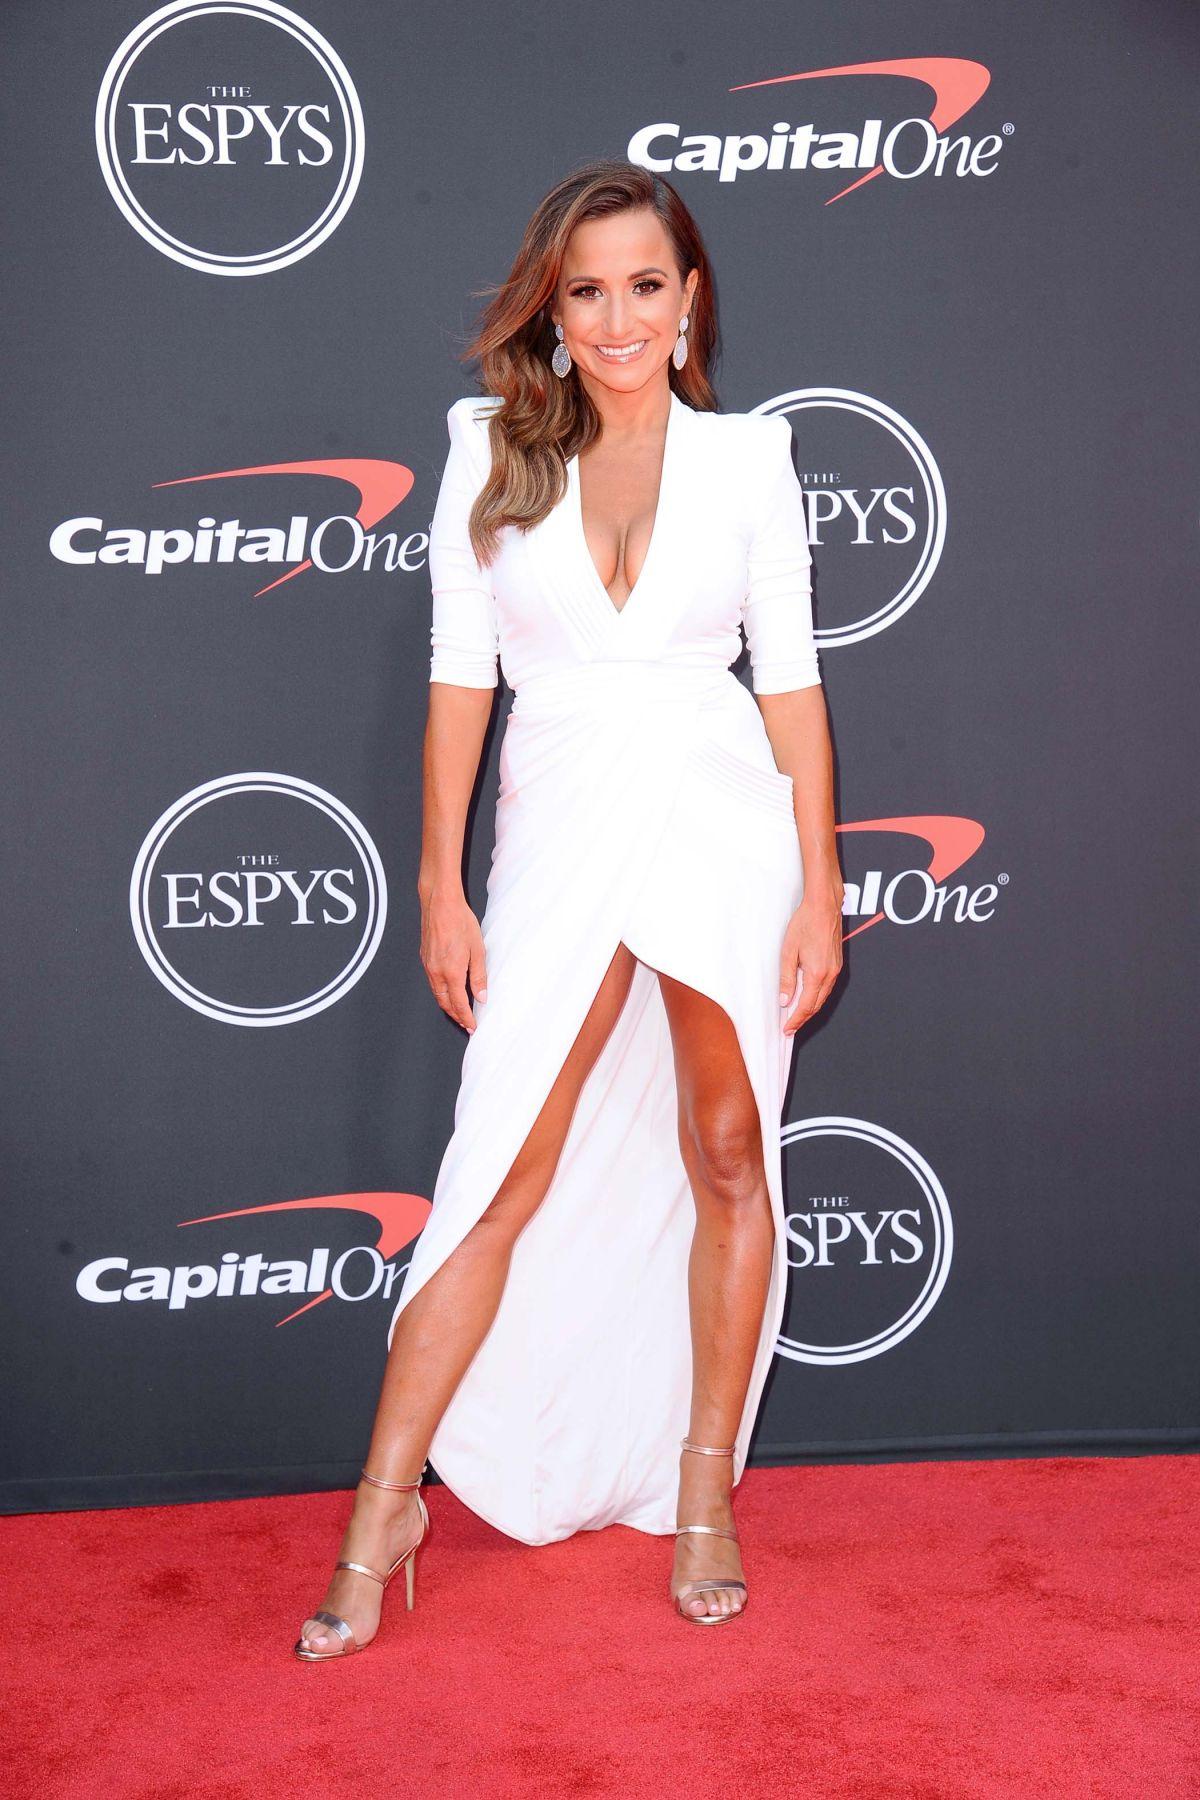 Dianna Russini 2019 : Dianna Russini - ESPYS 2019 Awards